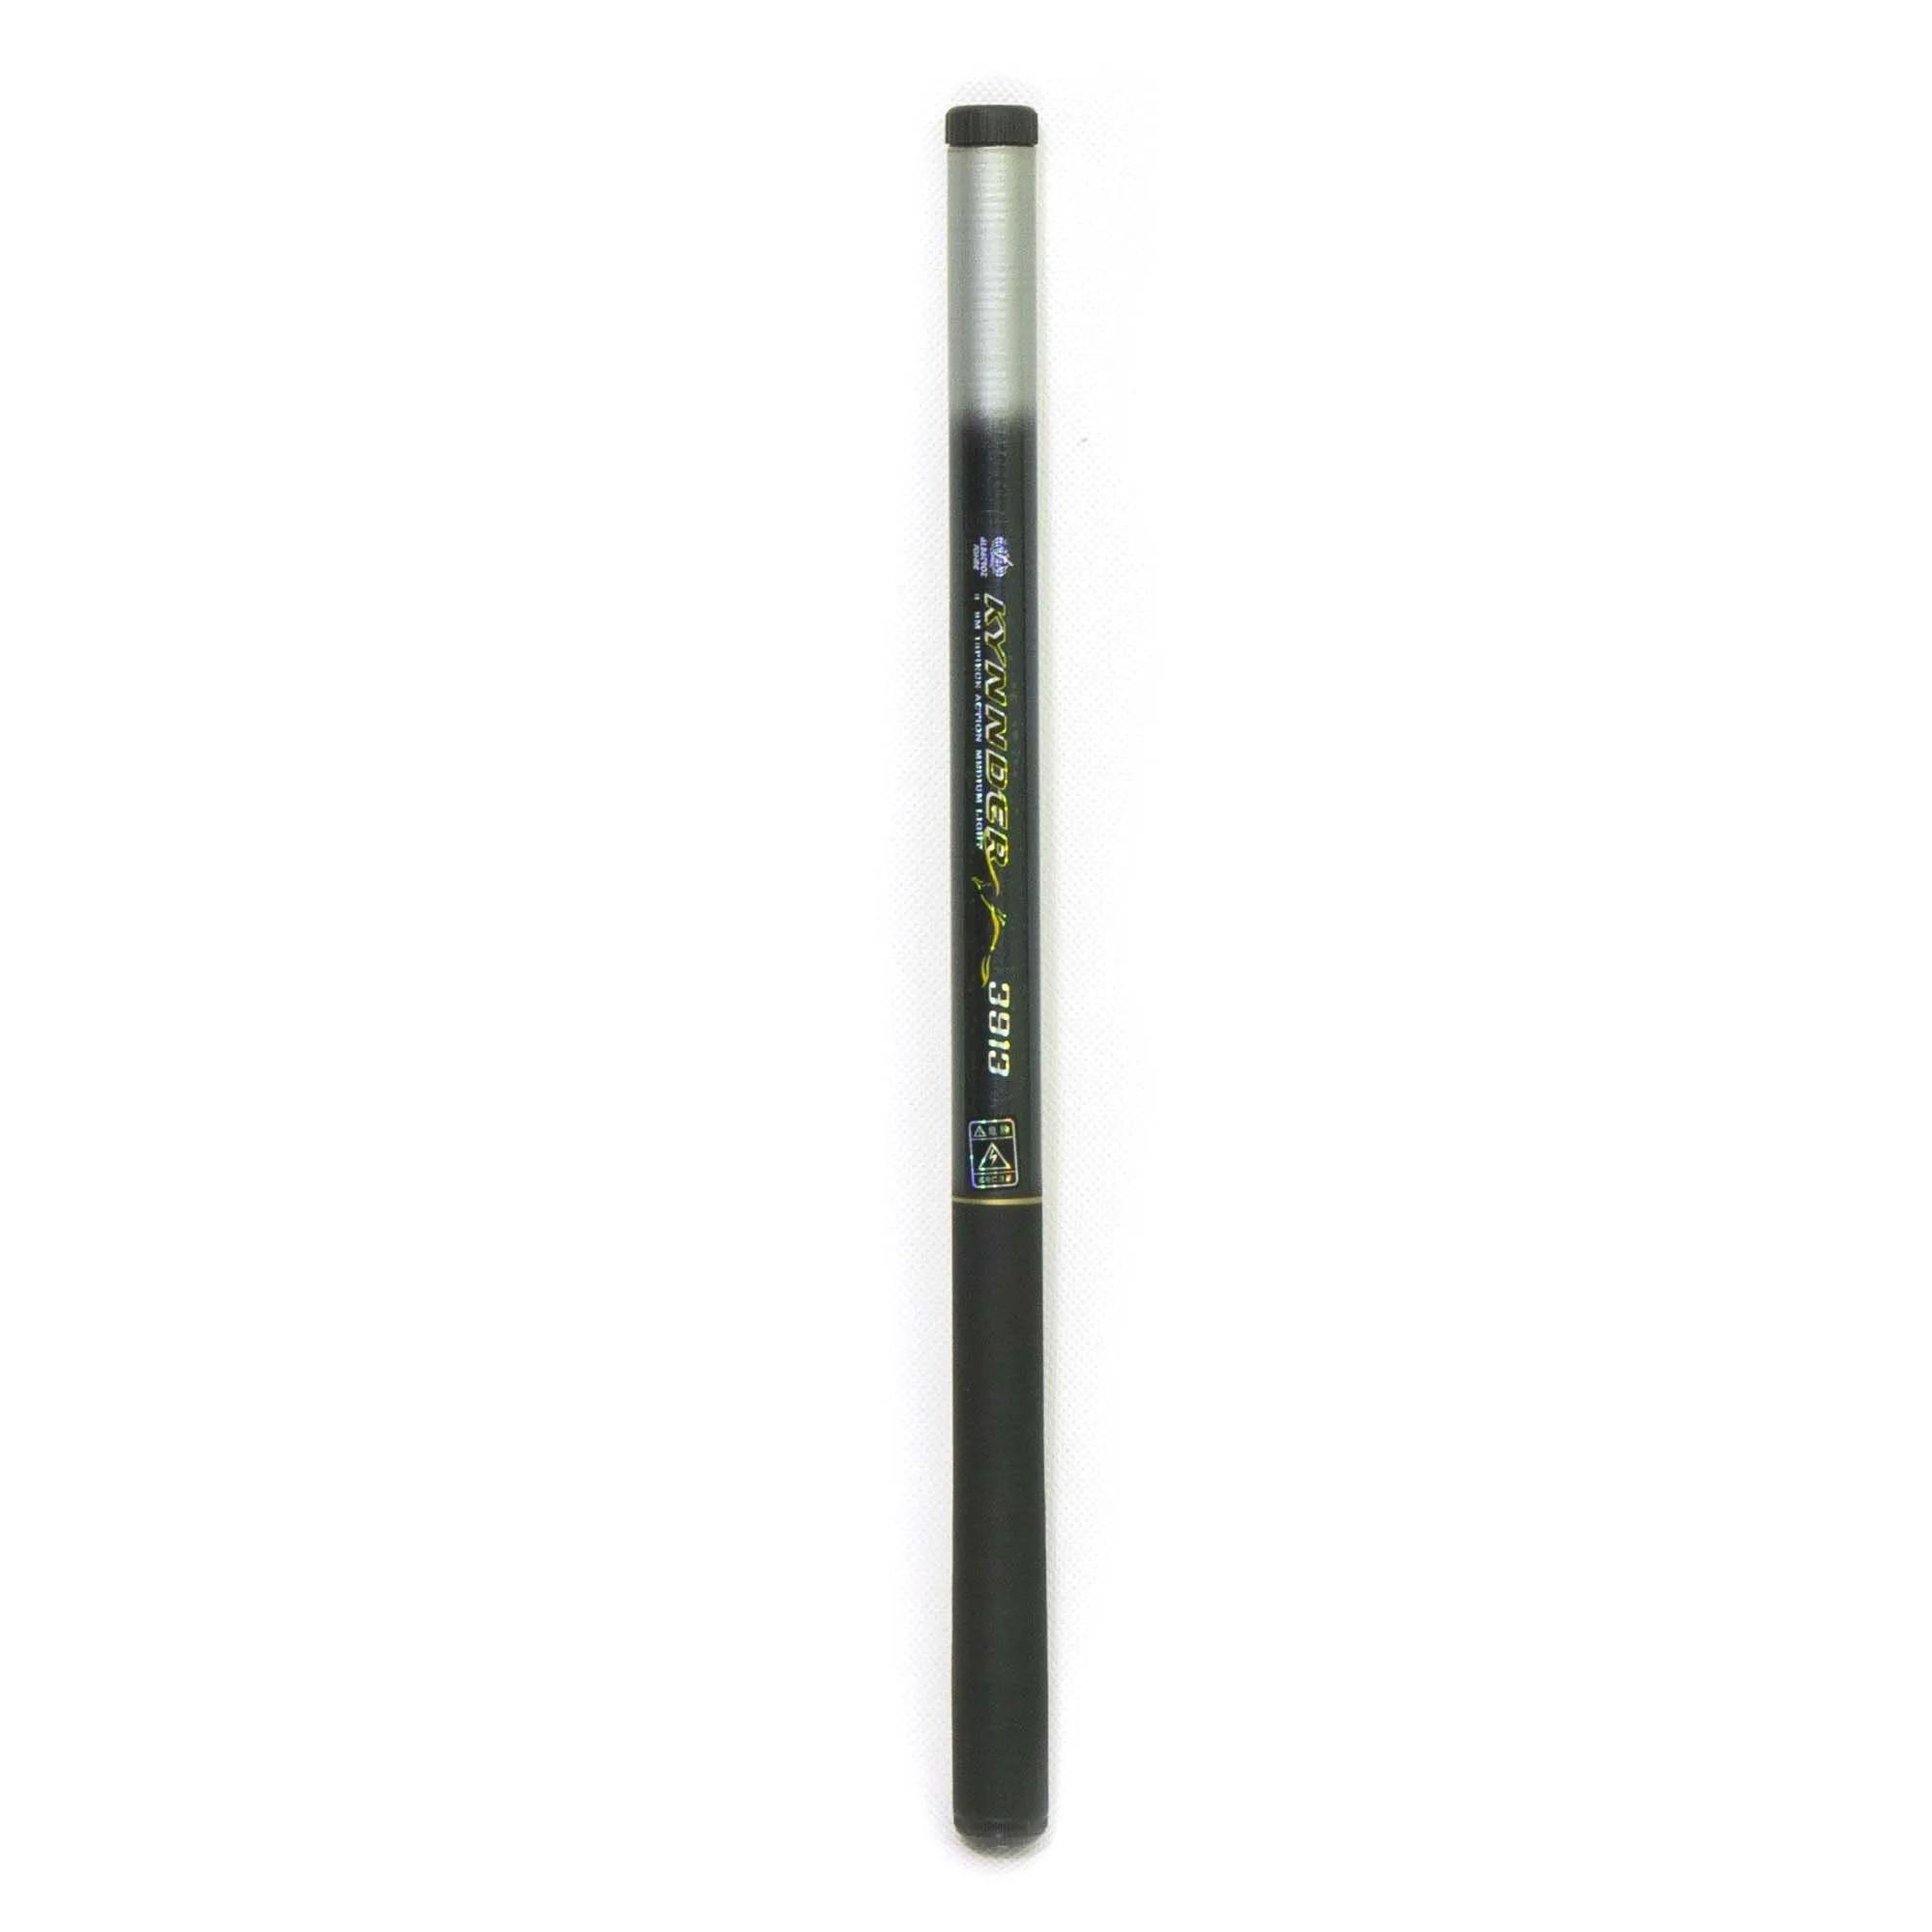 Vara Telescópica uso sem Molinete Kynnder 45% Carbono 3,00m - 10P  - Artpesca